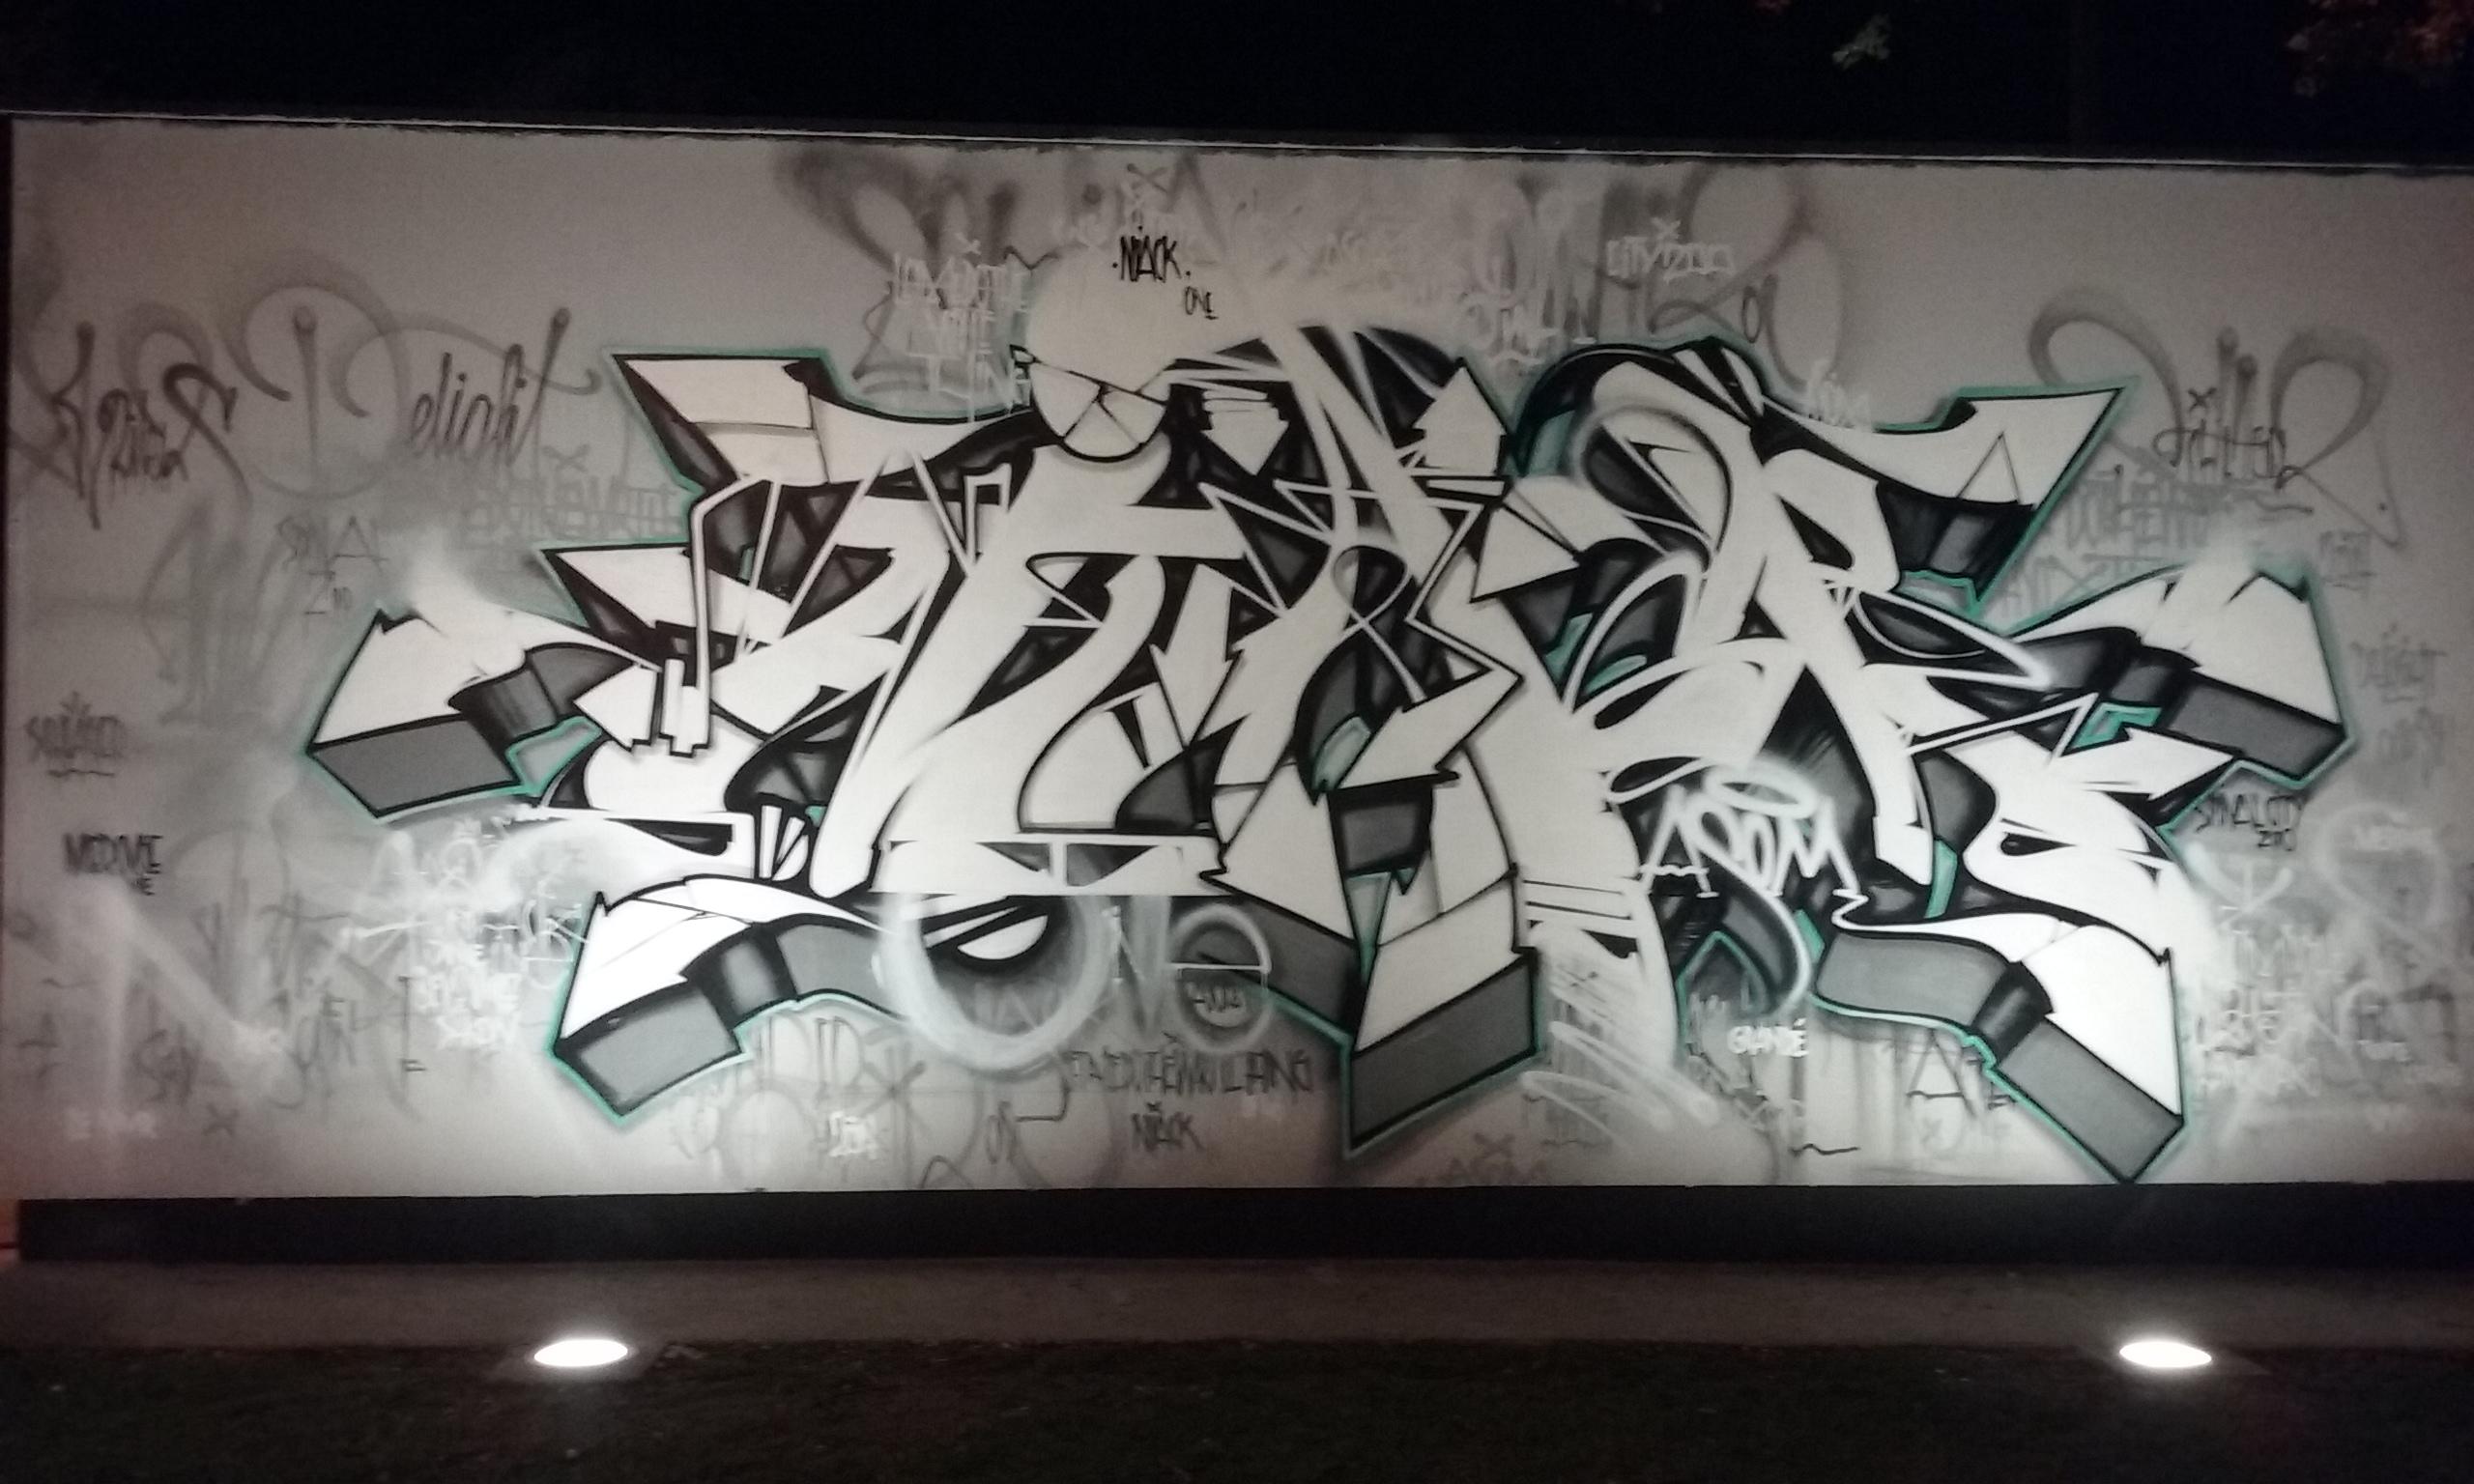 20170915_Niack_bynight_lemurepinal